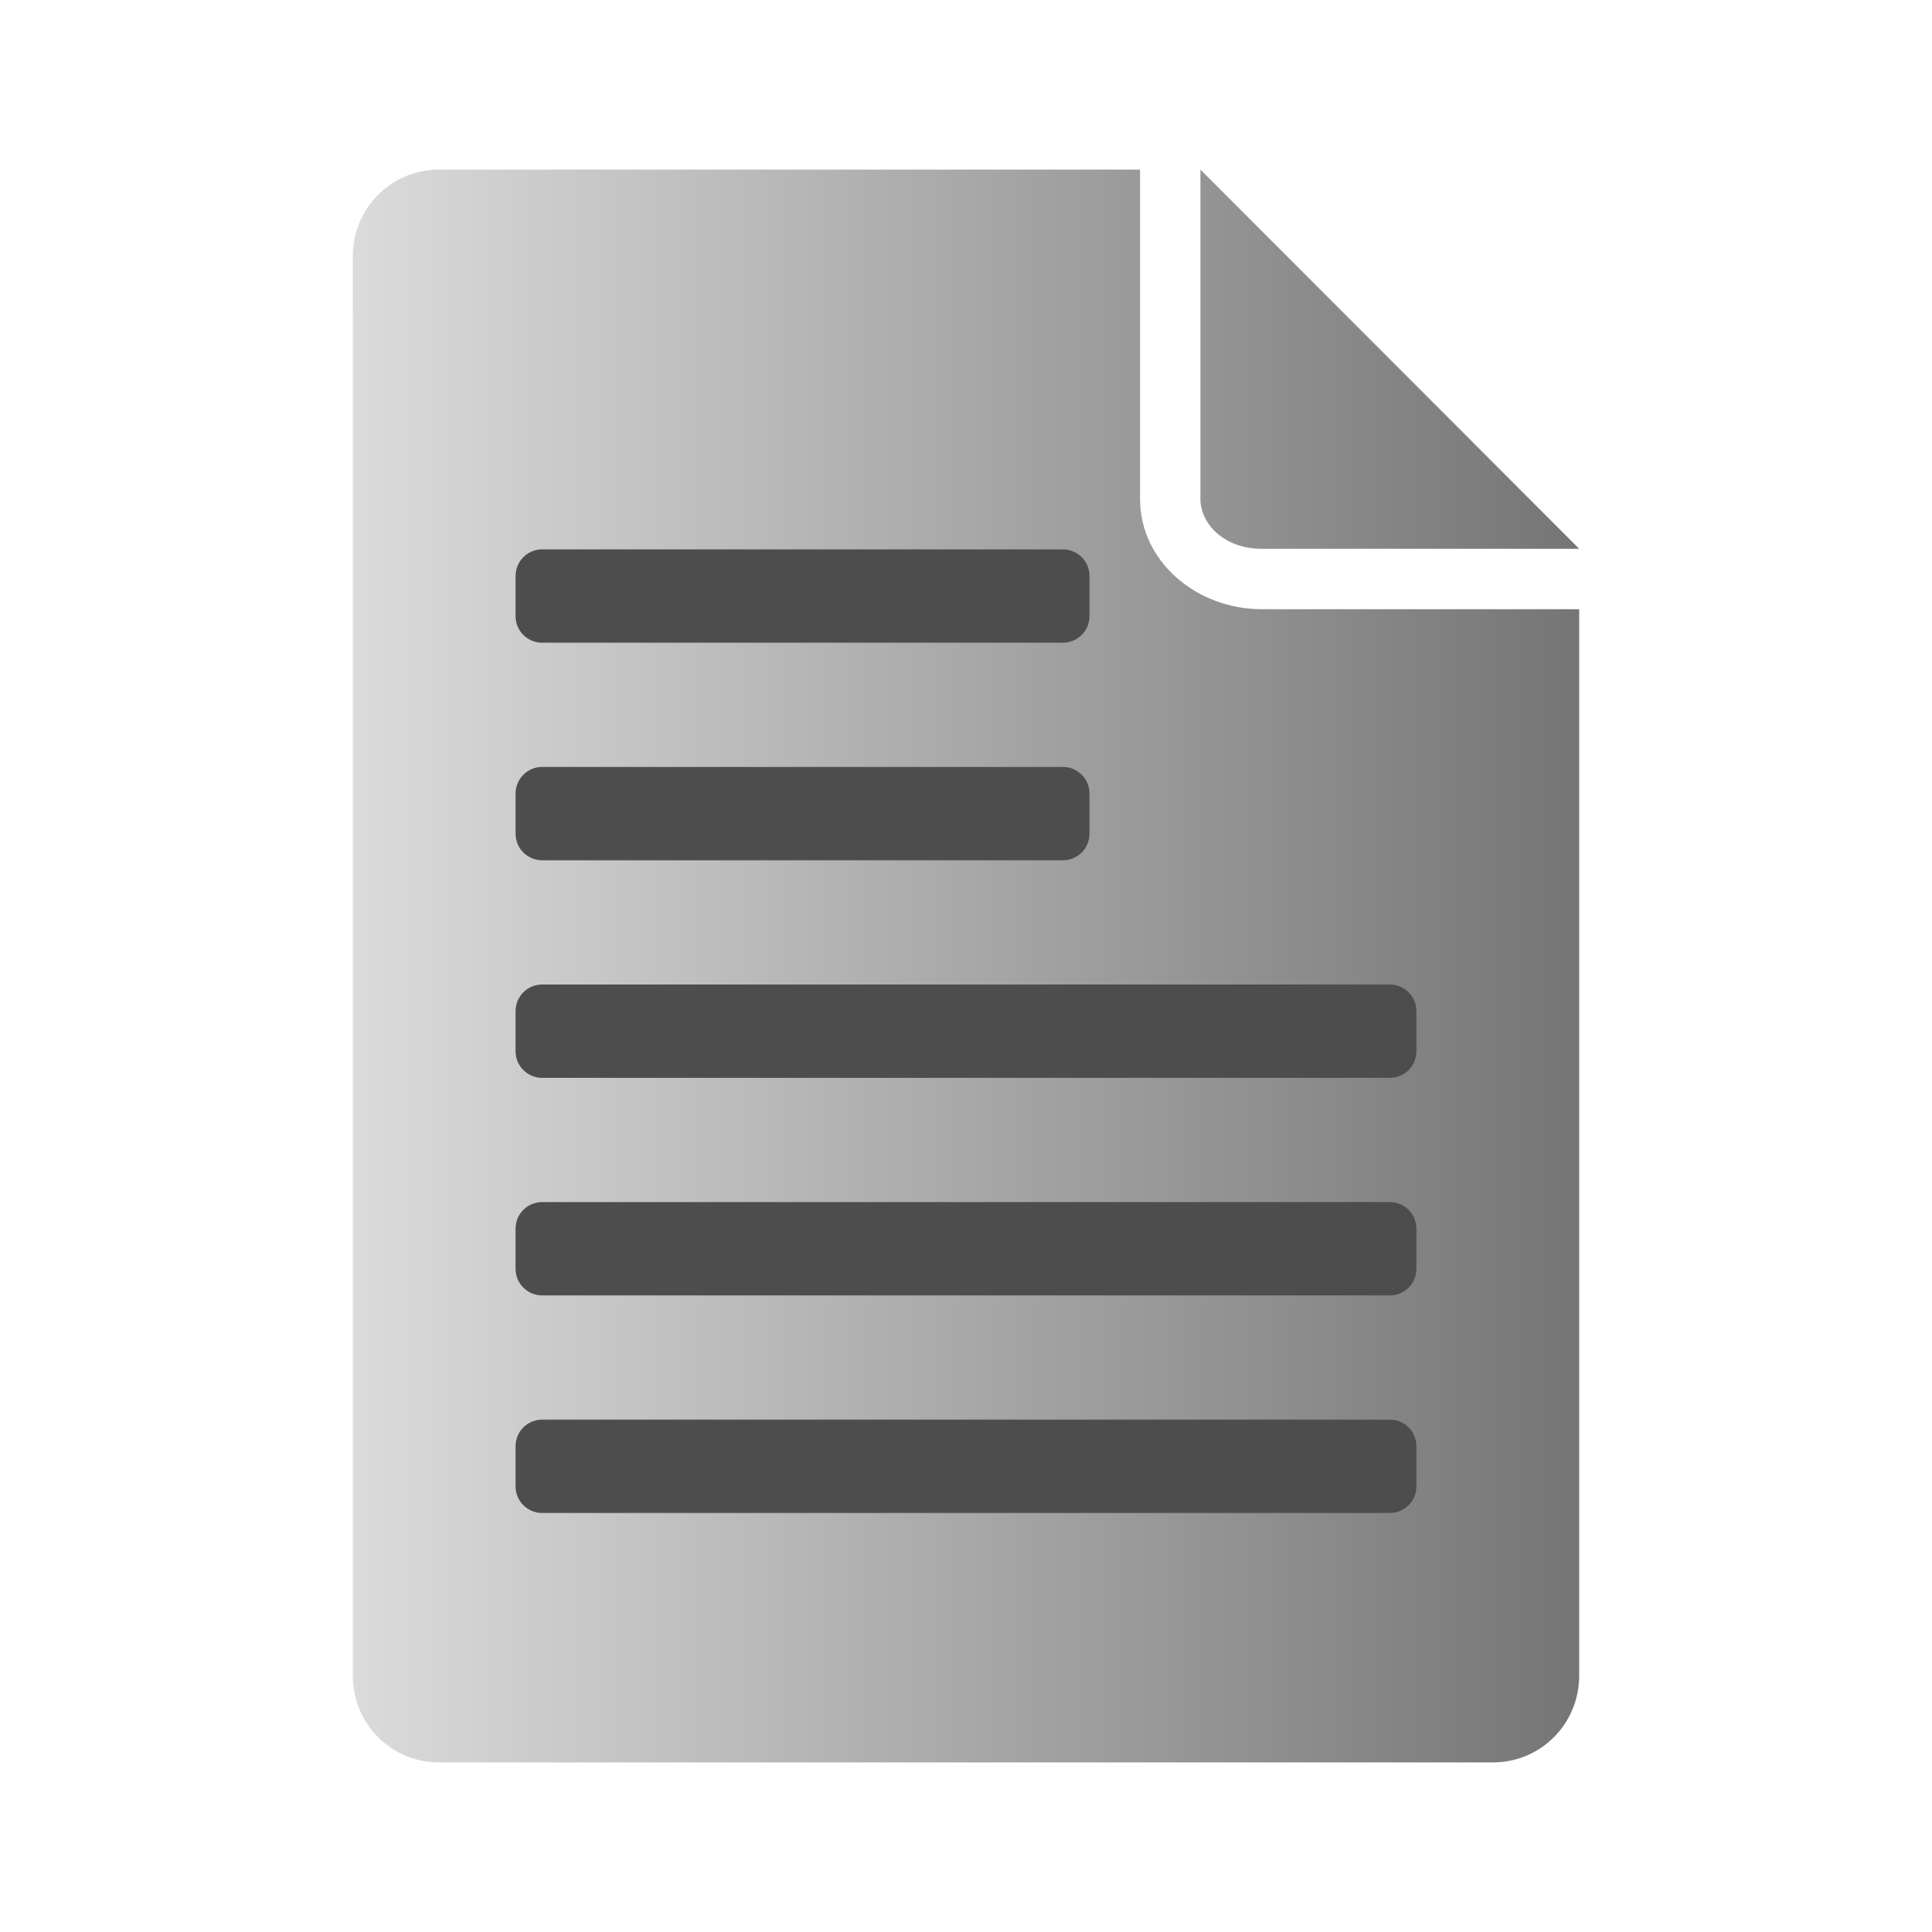 Text icon big image. Photo clipart file